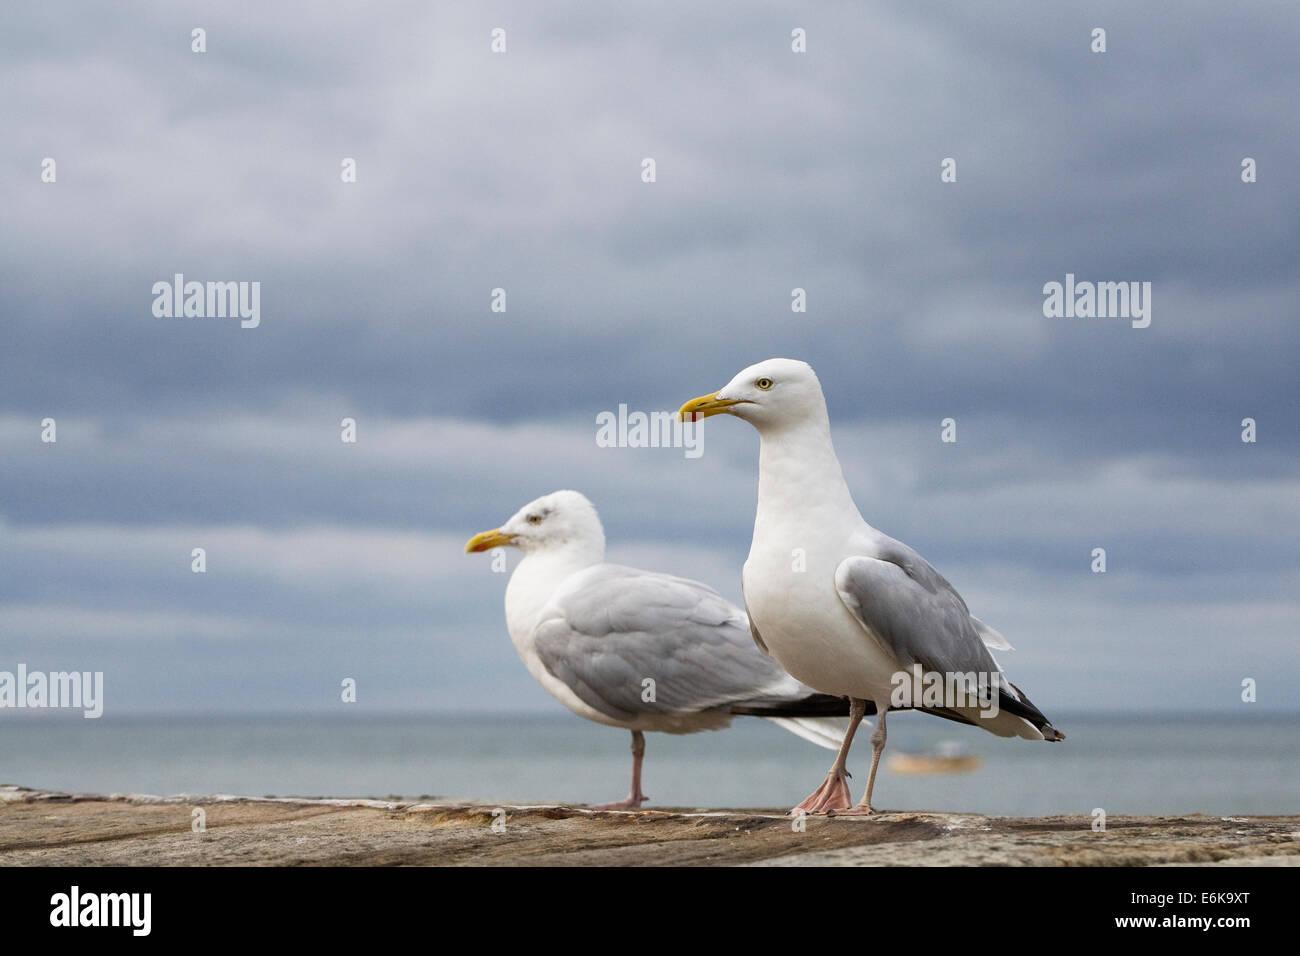 Larus argentatus. Herring Gulls on the sea wall. - Stock Image